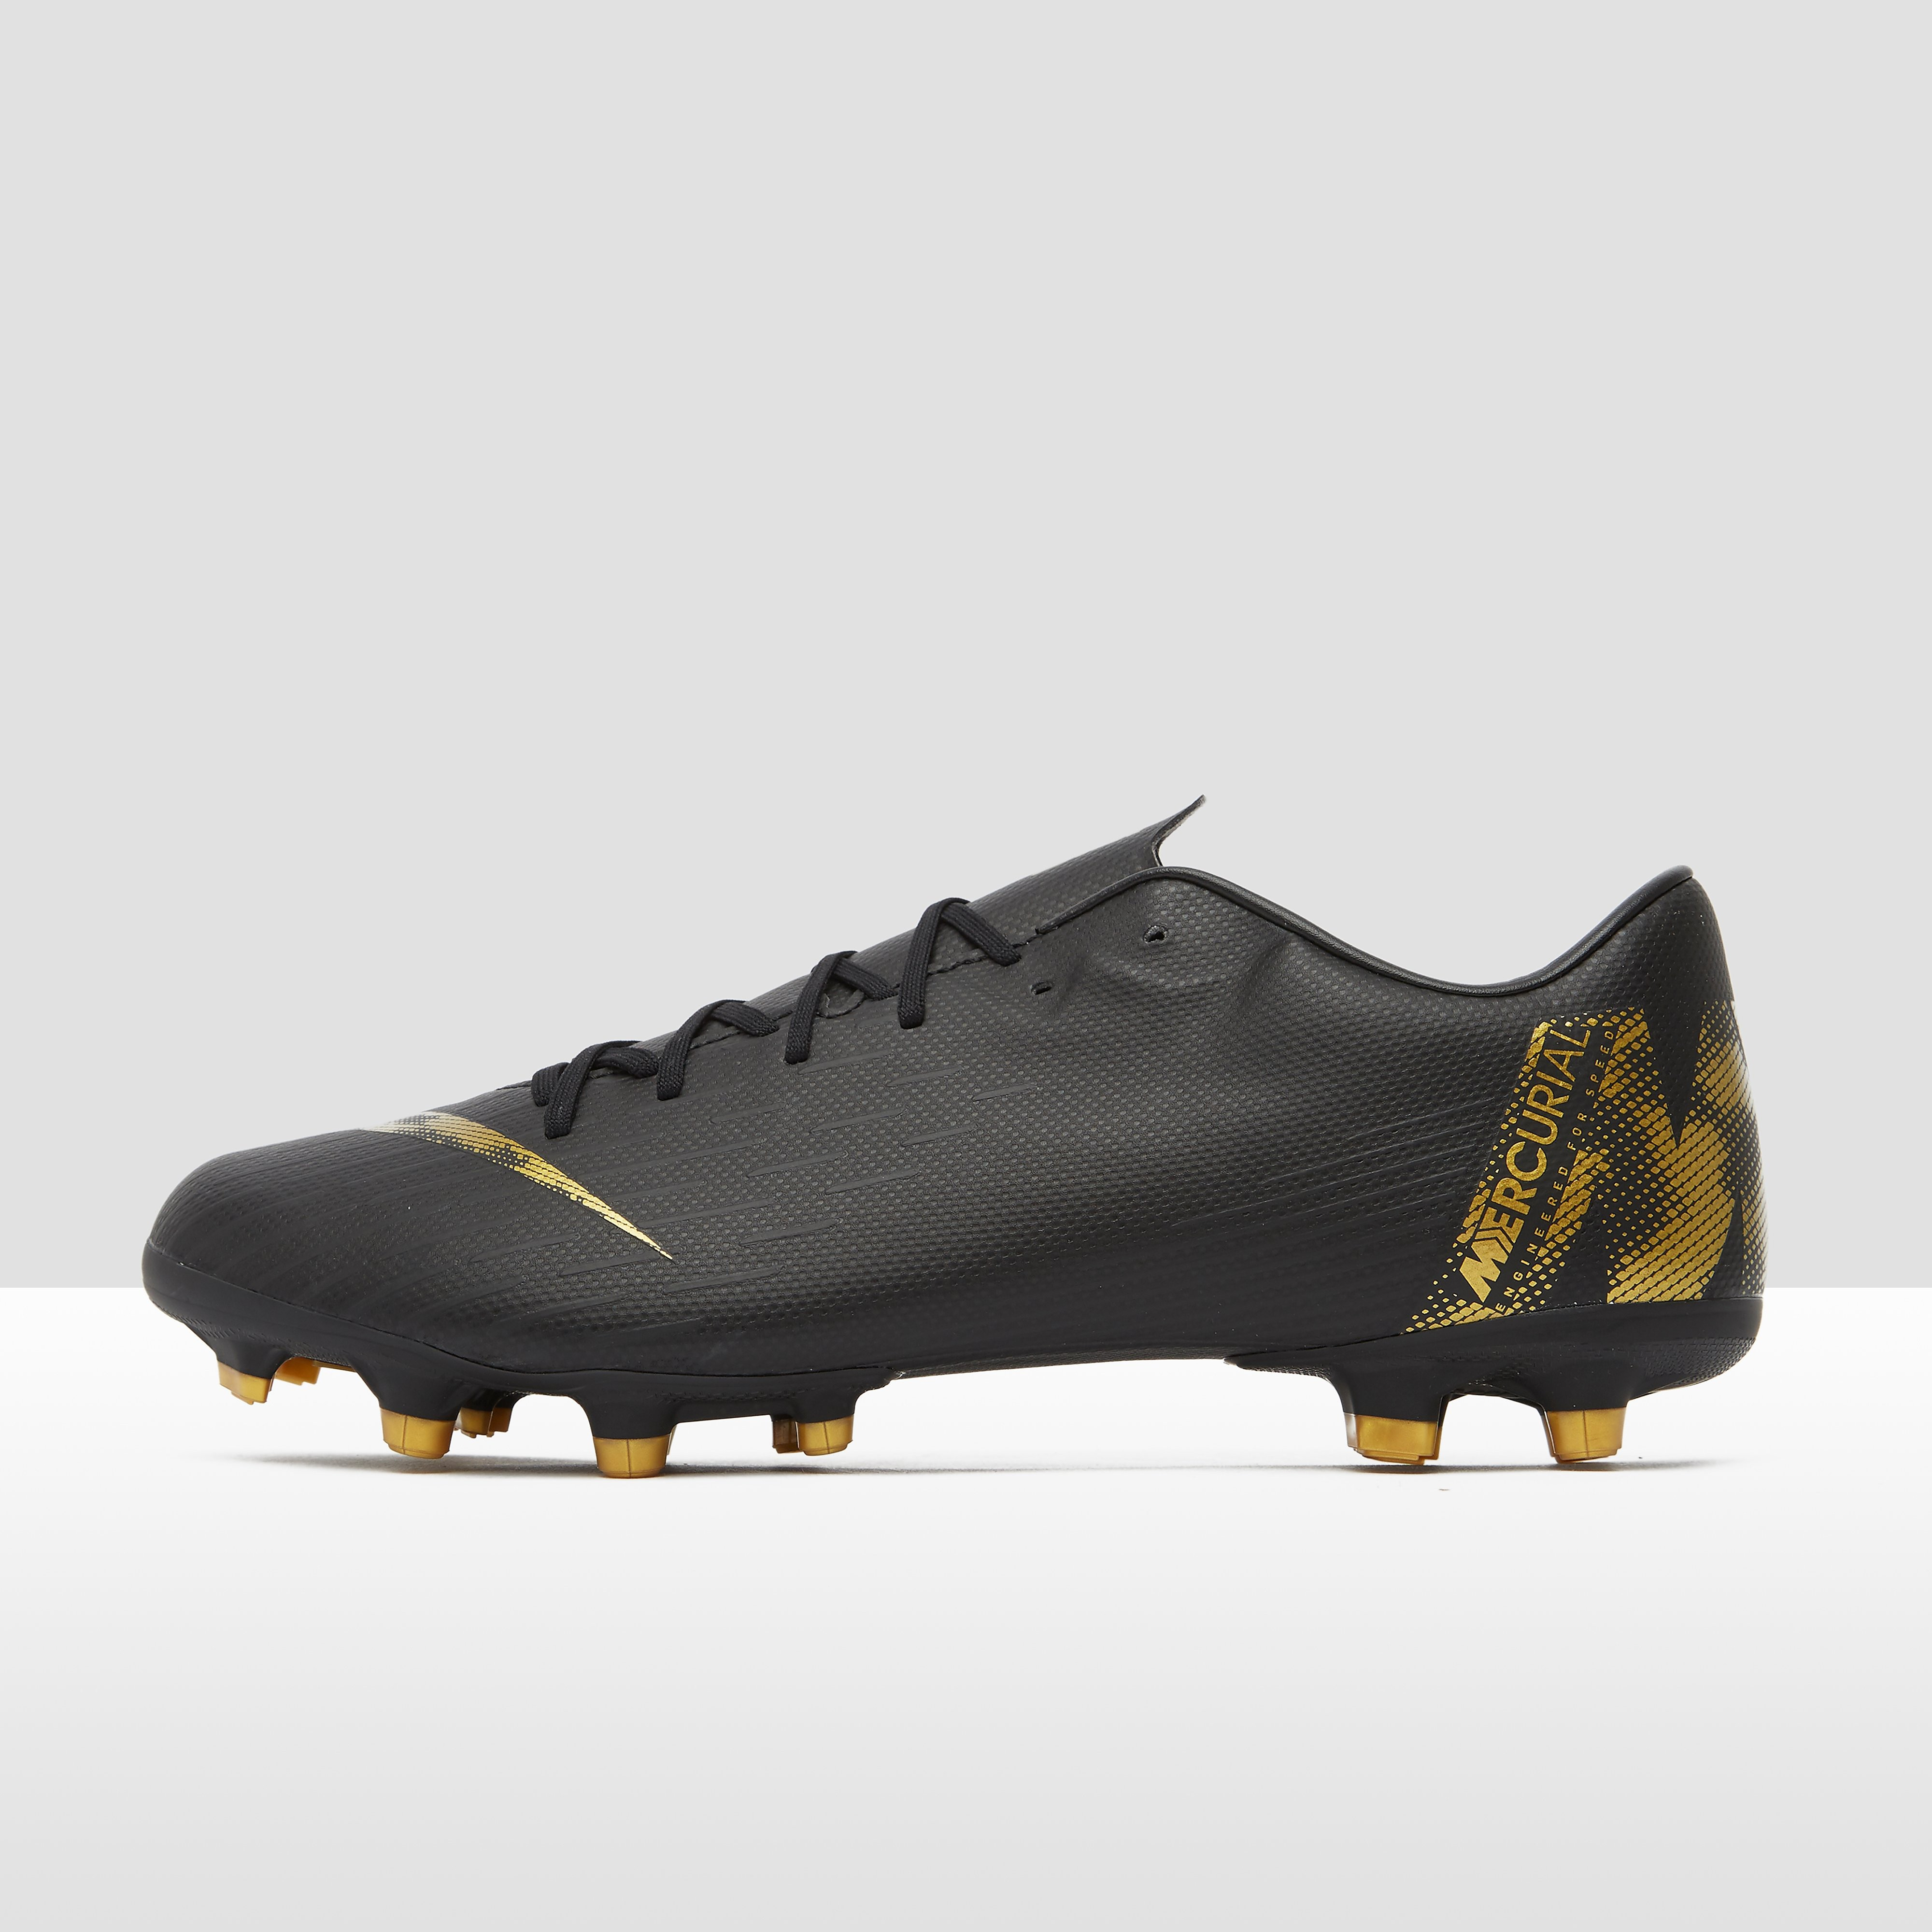 NIKE Mercurial vapor 12 academy mg voetbalschoenen zwart/goud Dames